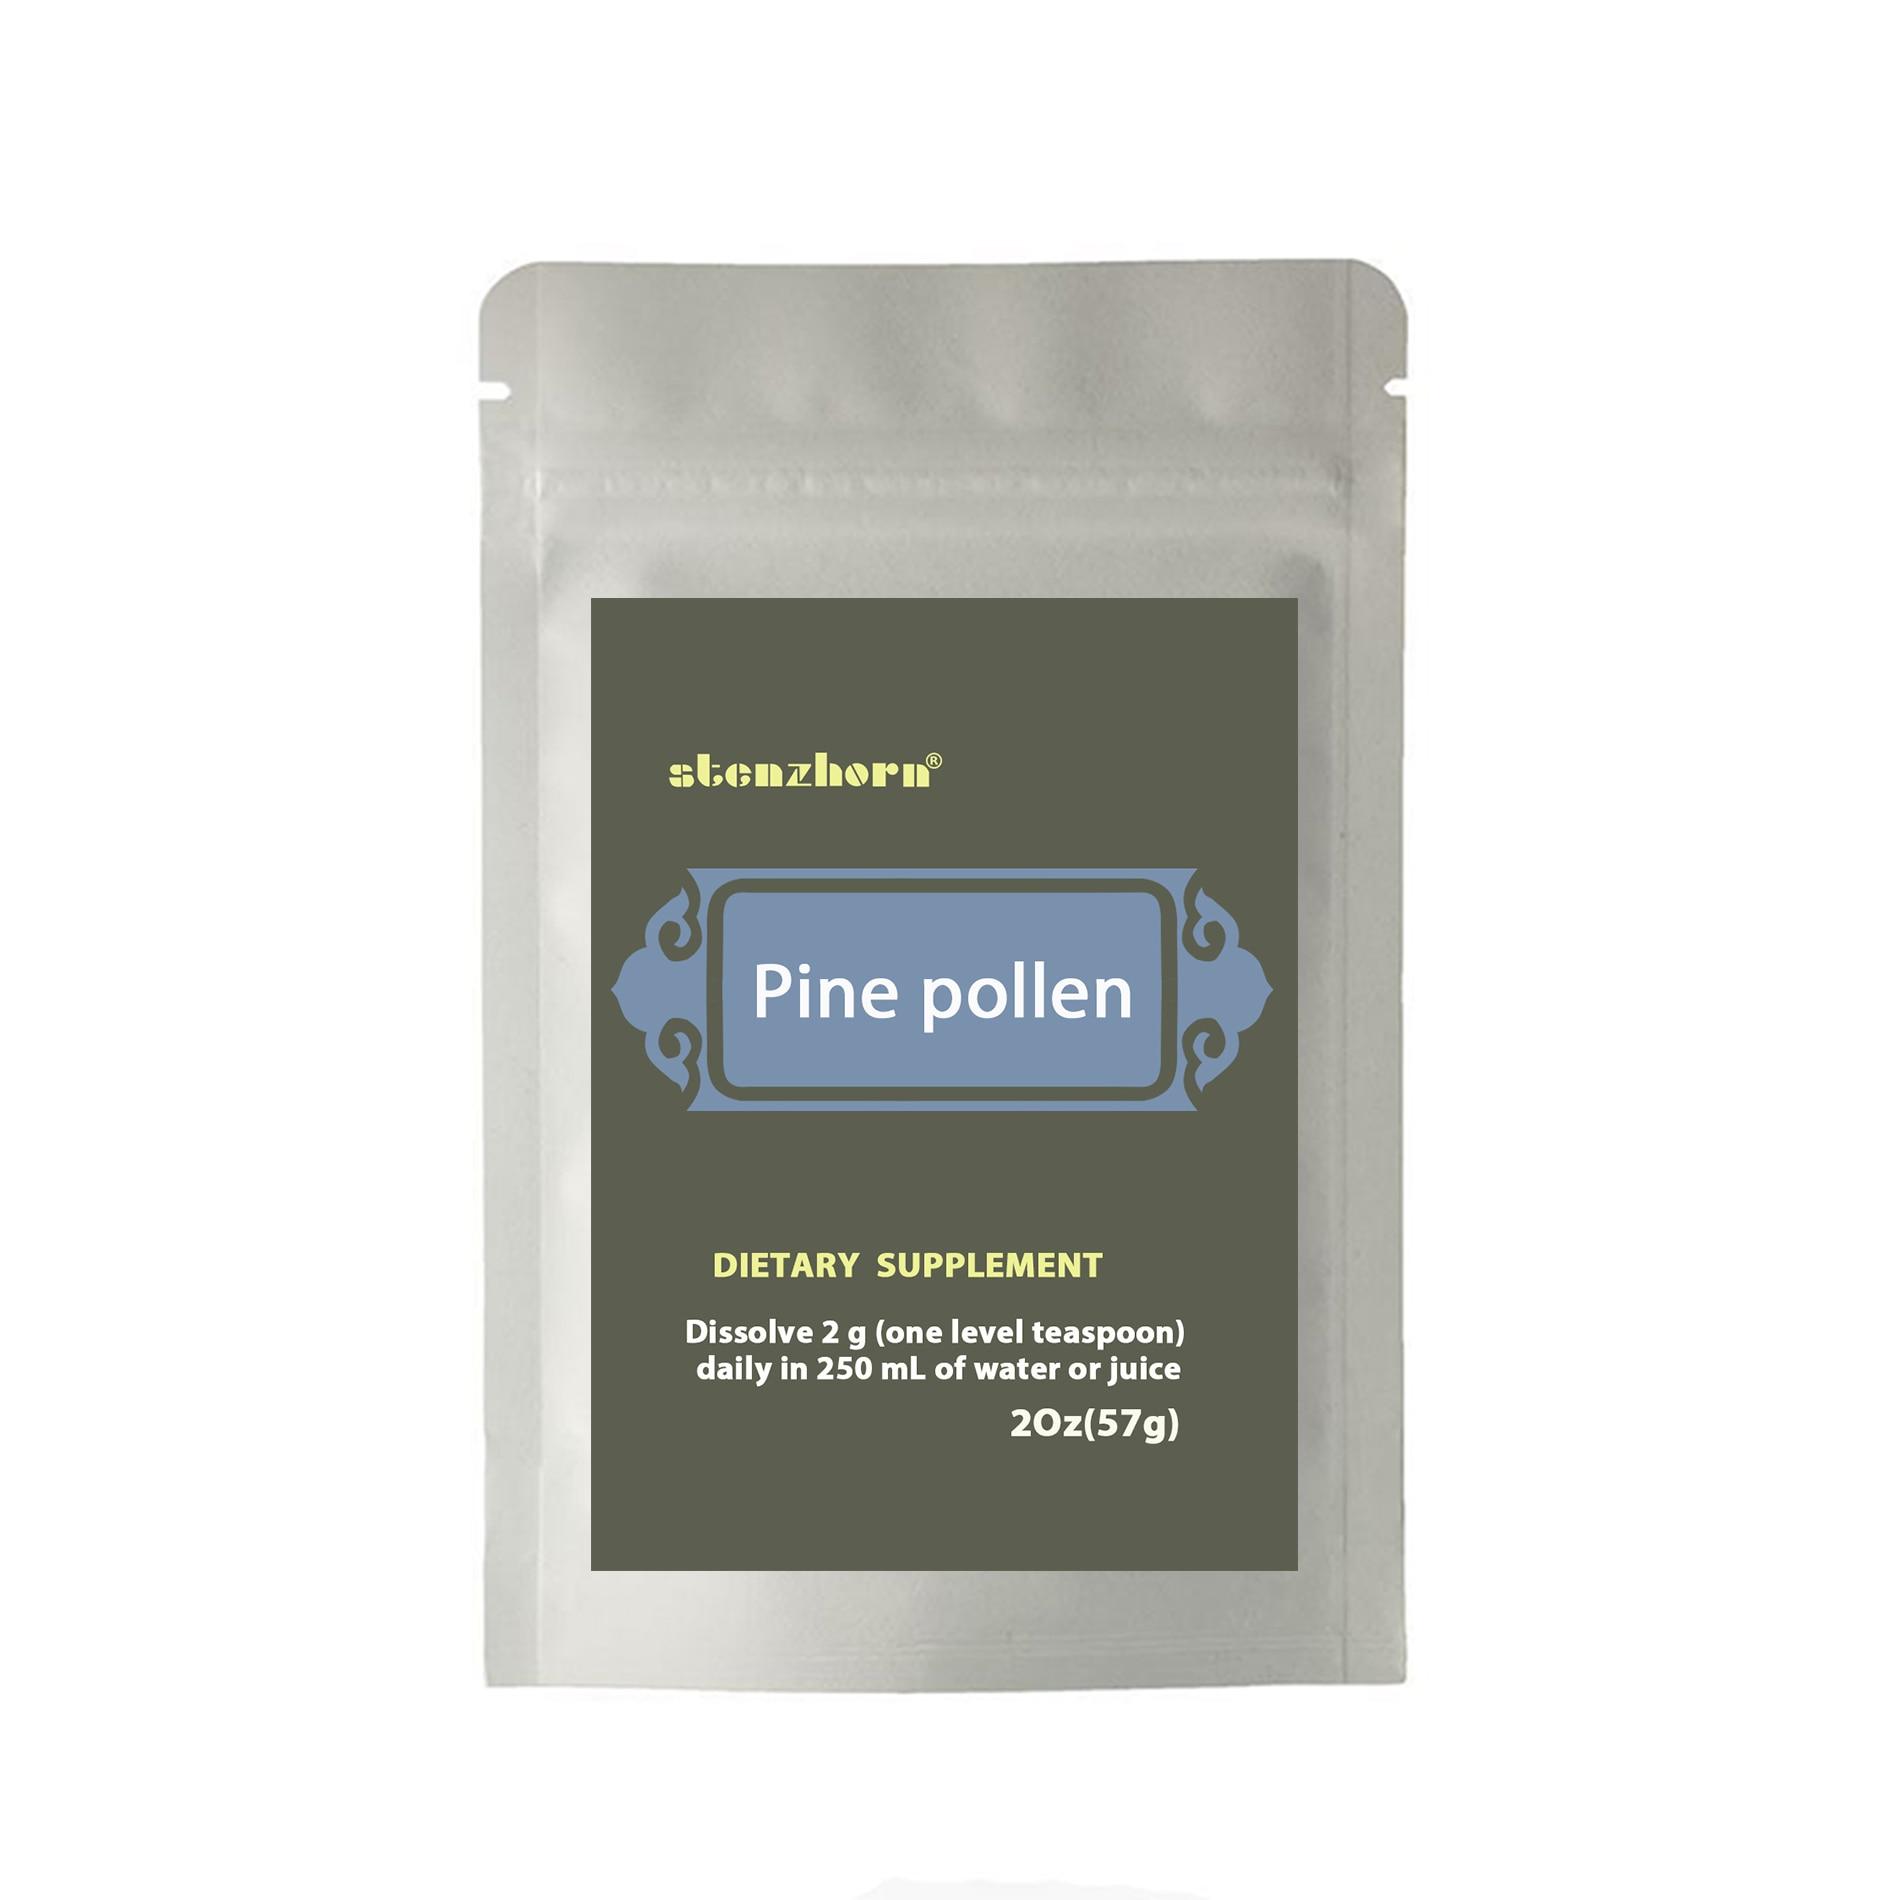 PINE POLLEN 2Oz 57g  Pine pollen contains great anti-oxydation ingredients natural vitamineA, C, E, phospholipid high quality pine pollen natural masson pine wild genuine no sugar no added additives pine pollen